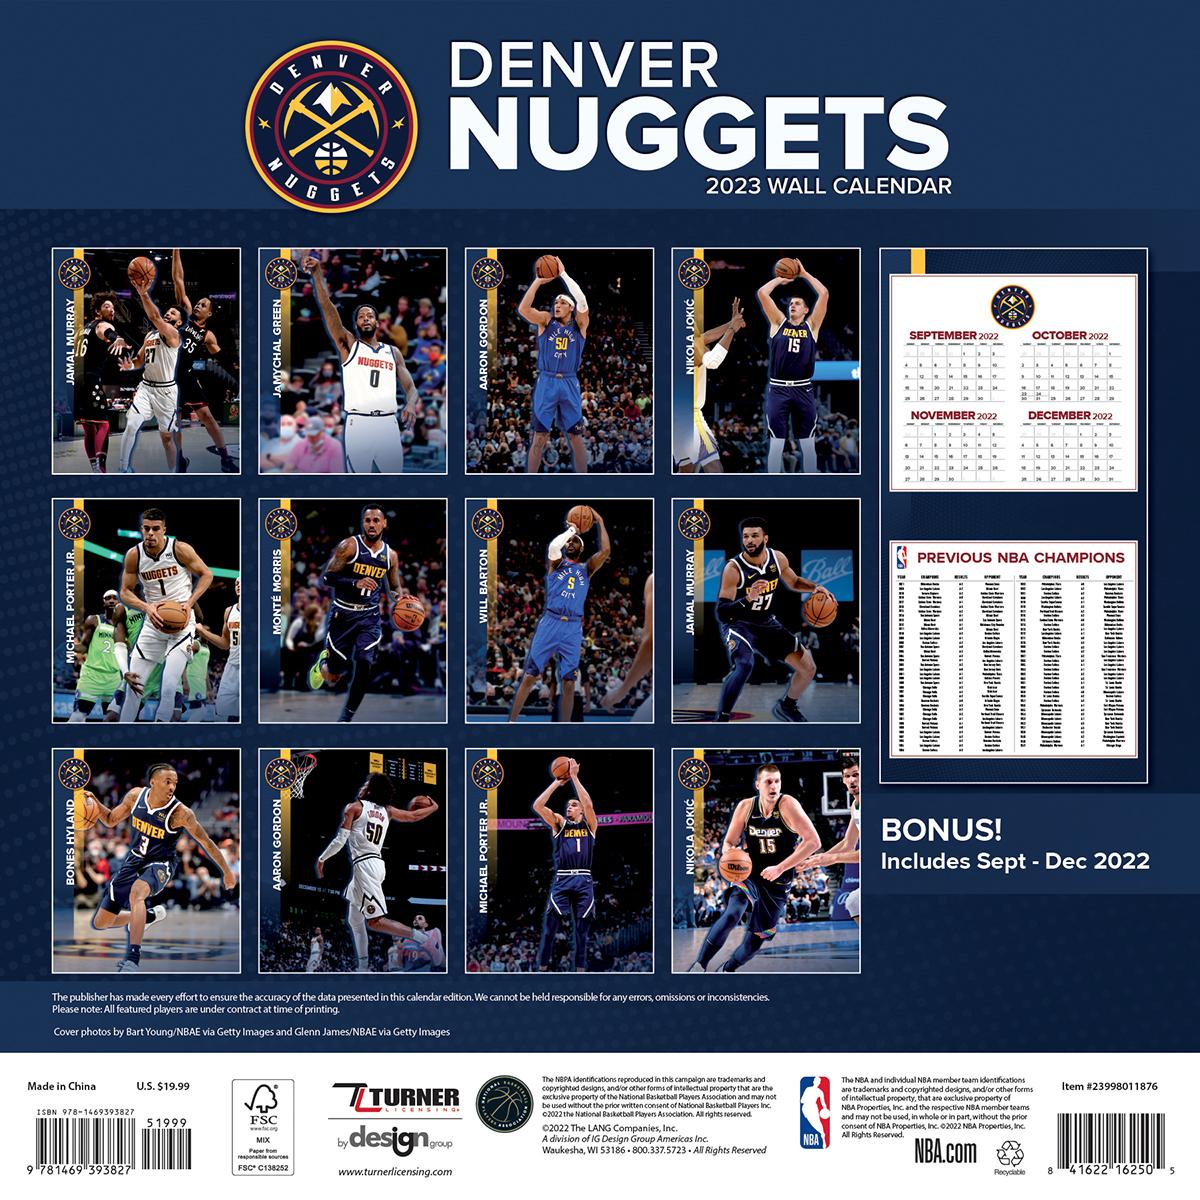 Denver Nuggets 2019 Wall Calendar